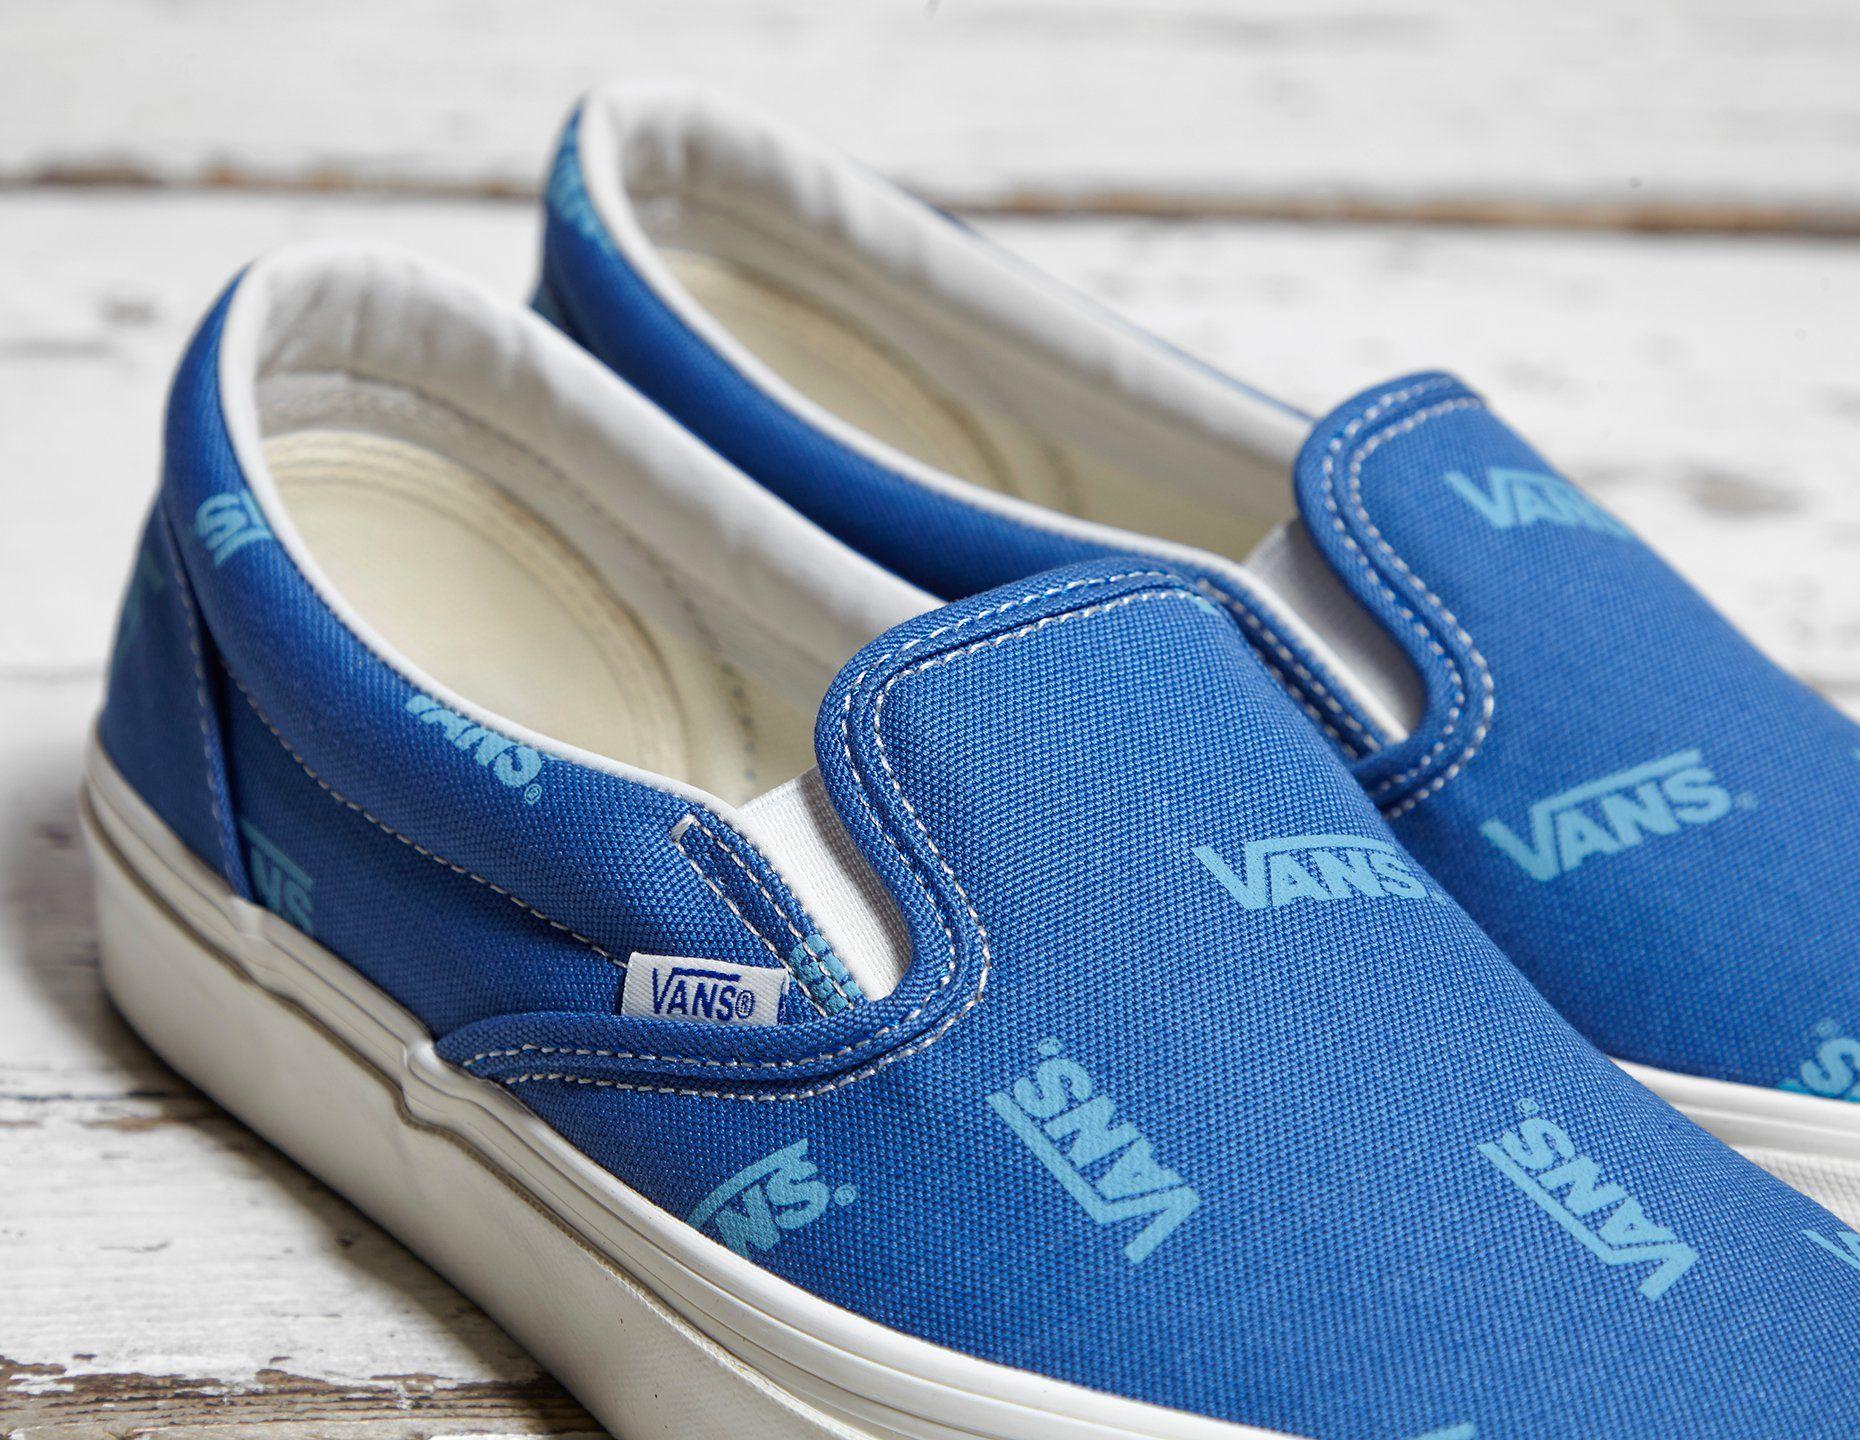 Vault by Vans Slip-On LX All Over Print